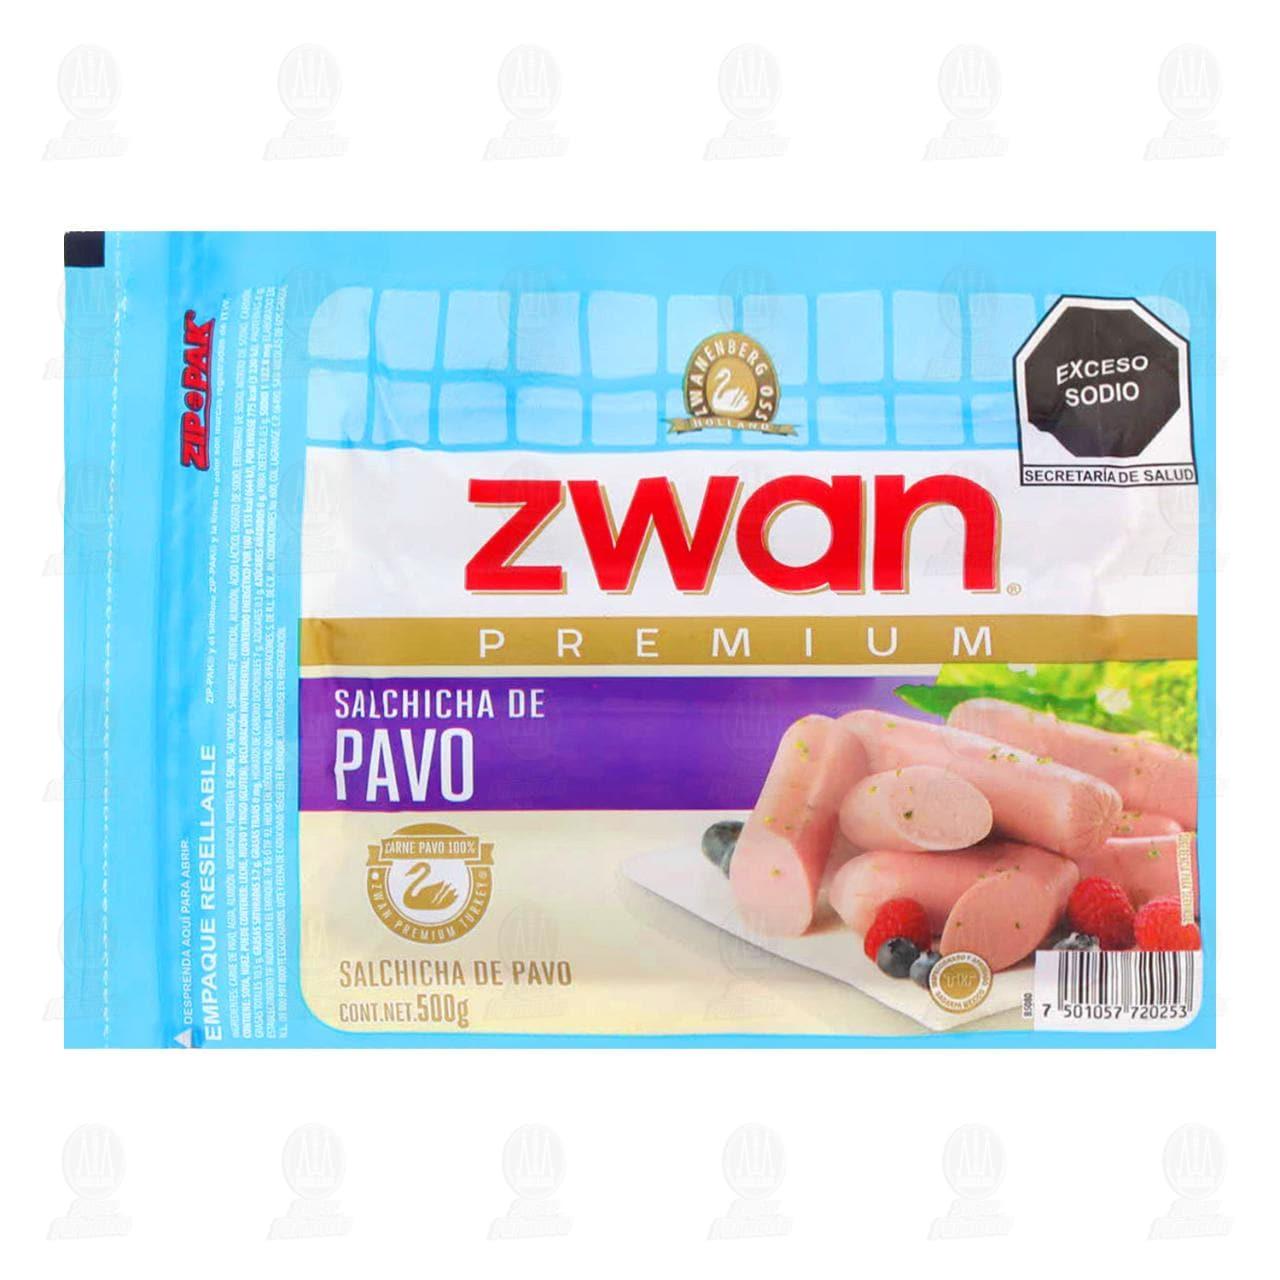 Salchicha Zwan Línea Premium de Pavo, 500 gr.